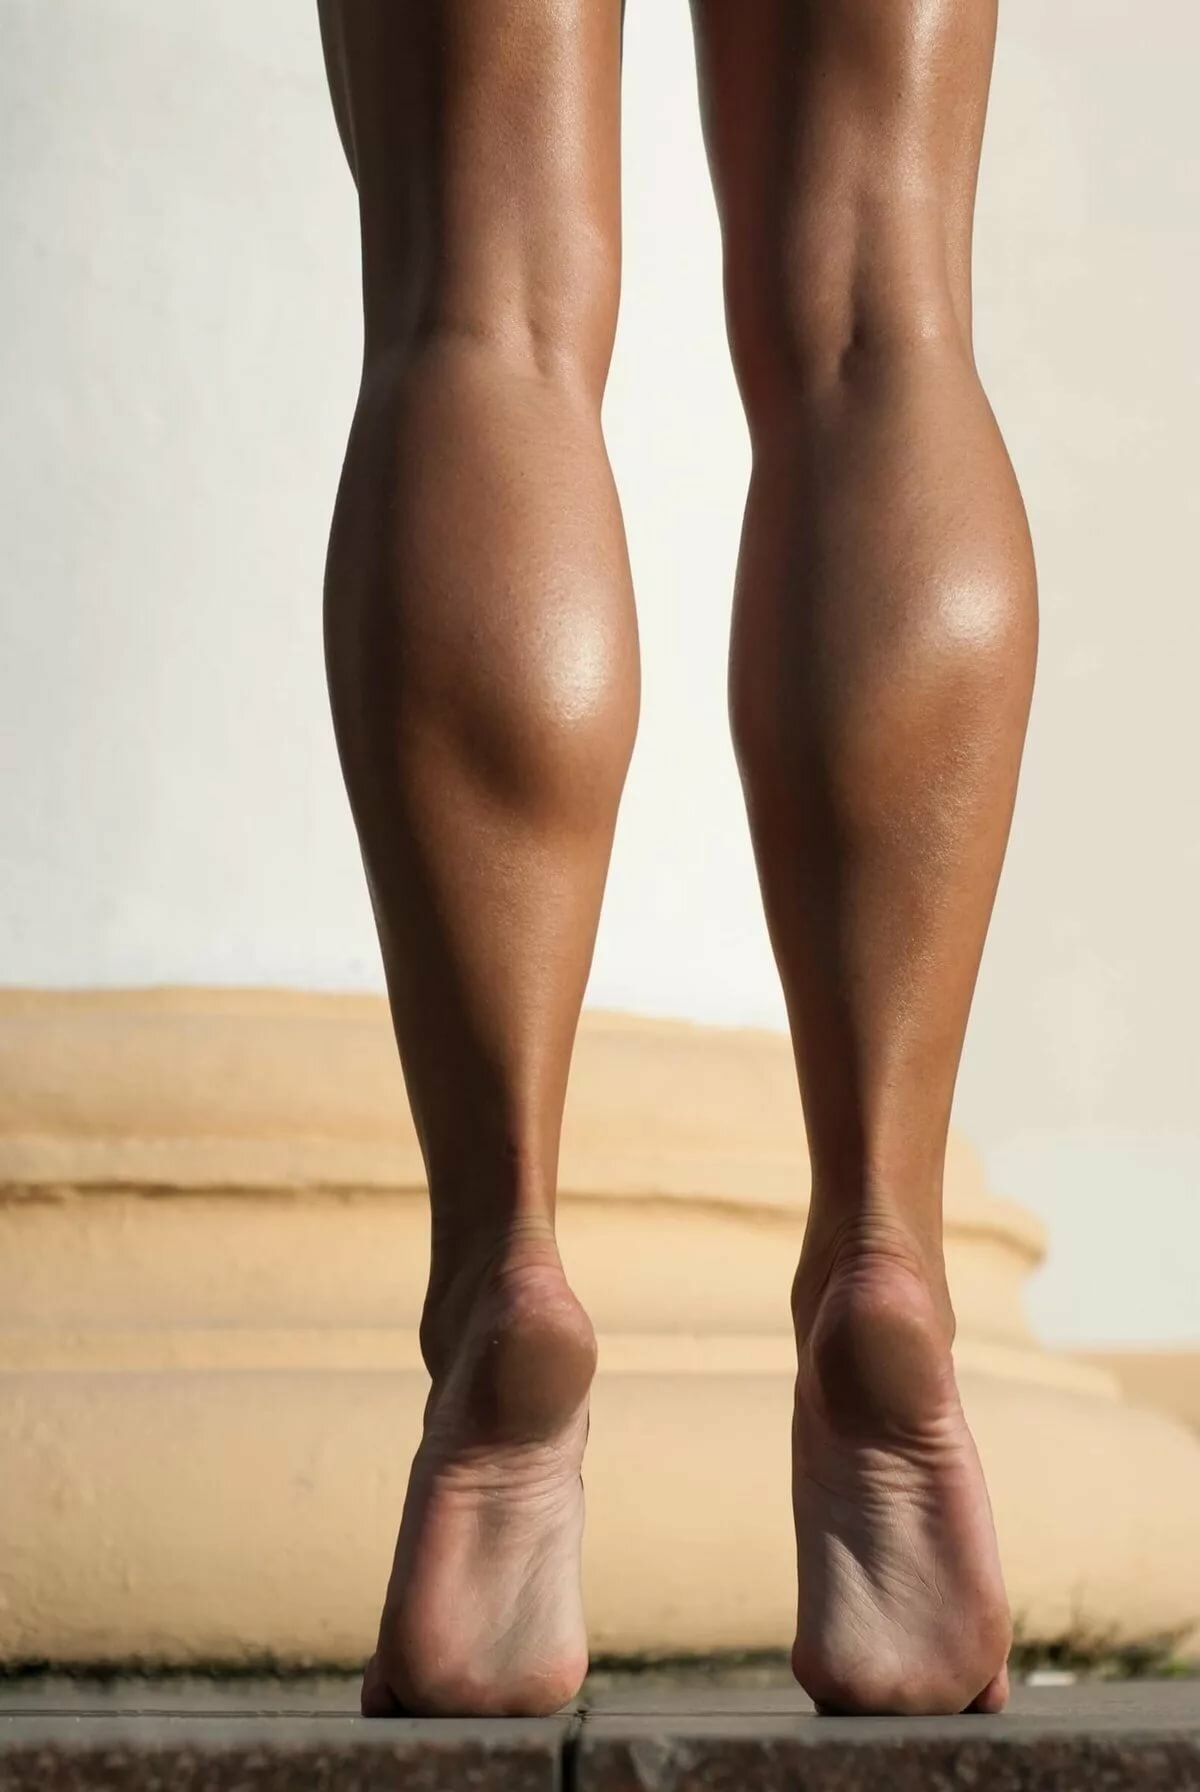 Фото замок между женских ног